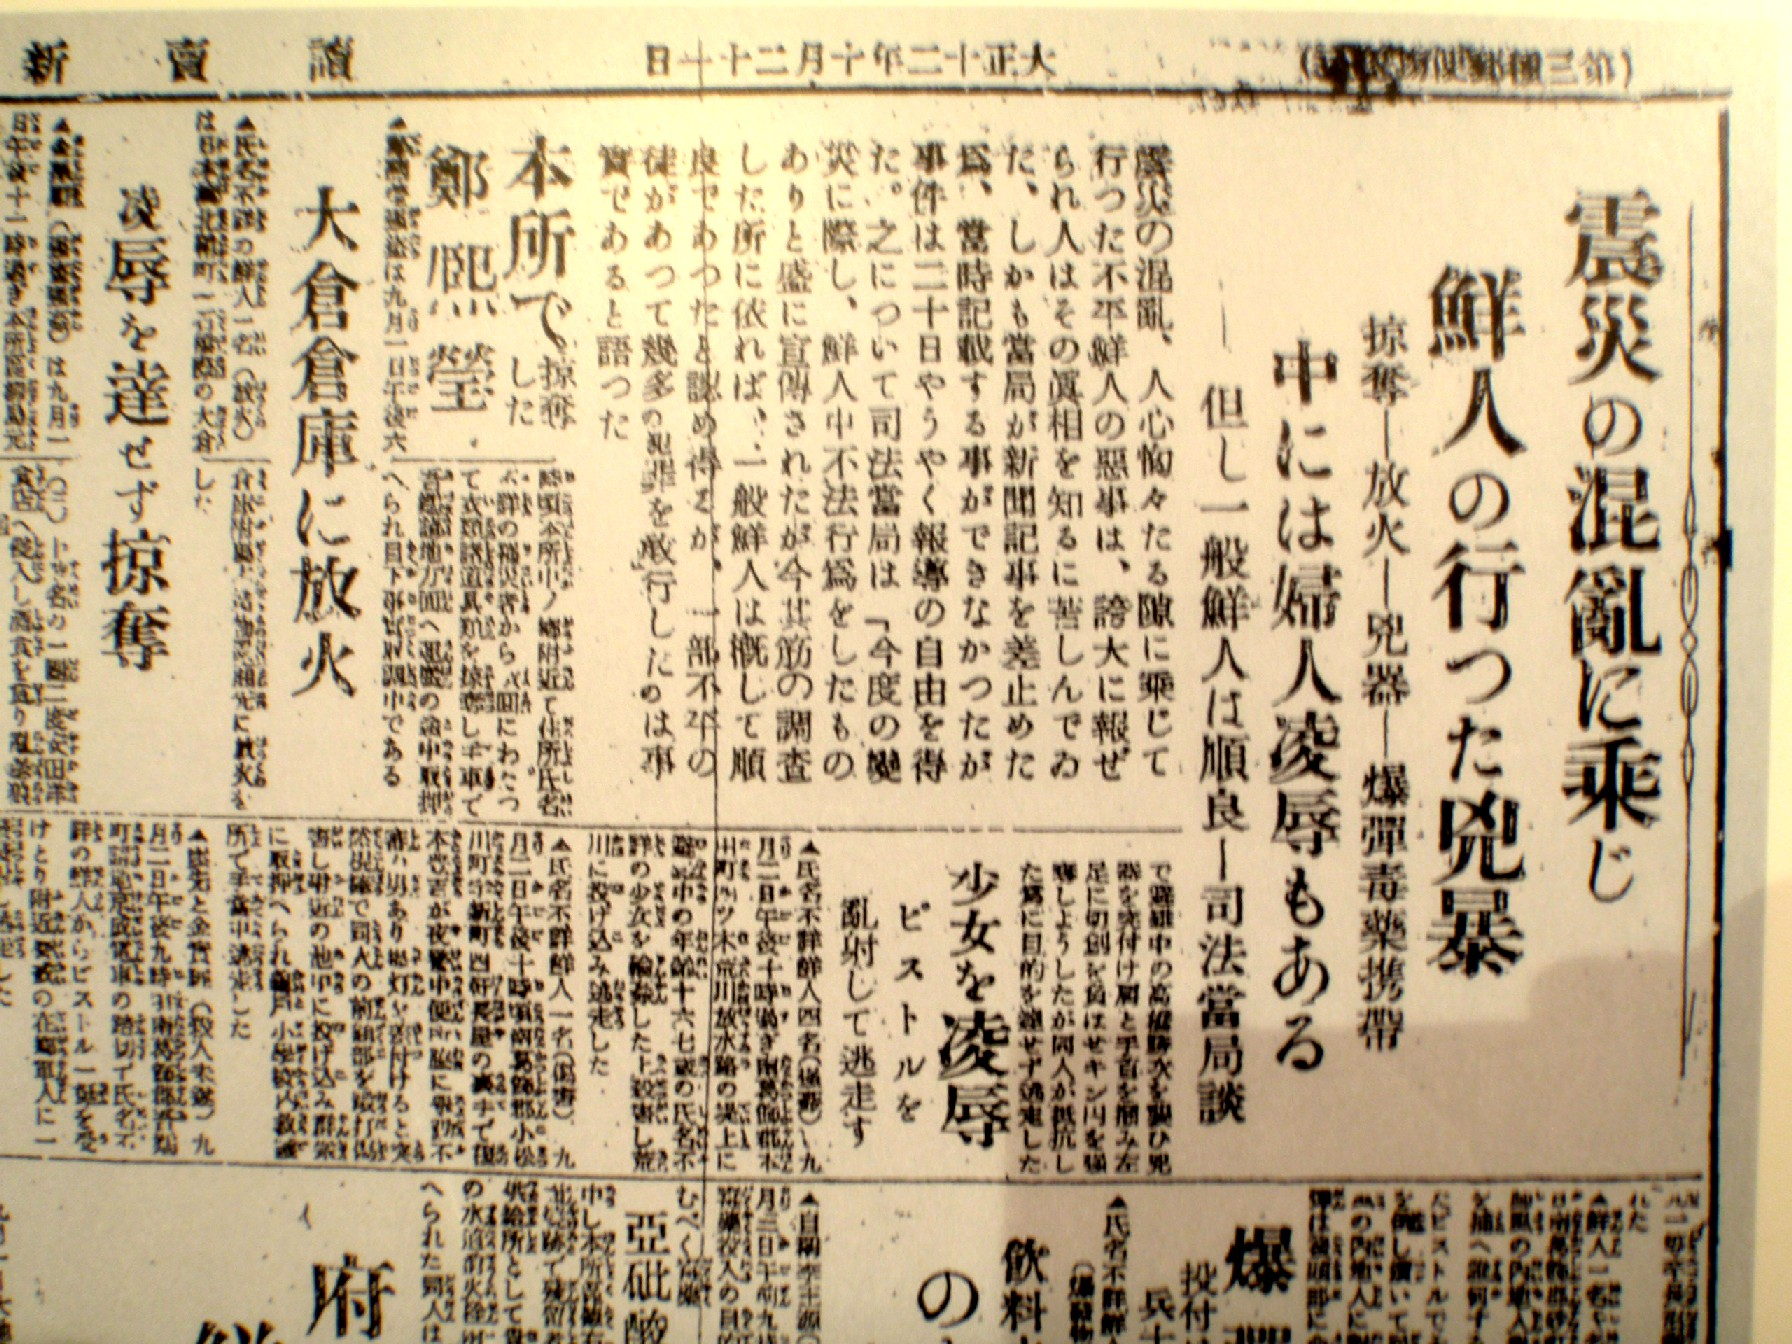 http://image.blog.livedoor.jp/yorogadi/imgs/f/2/f27d67cf.jpg